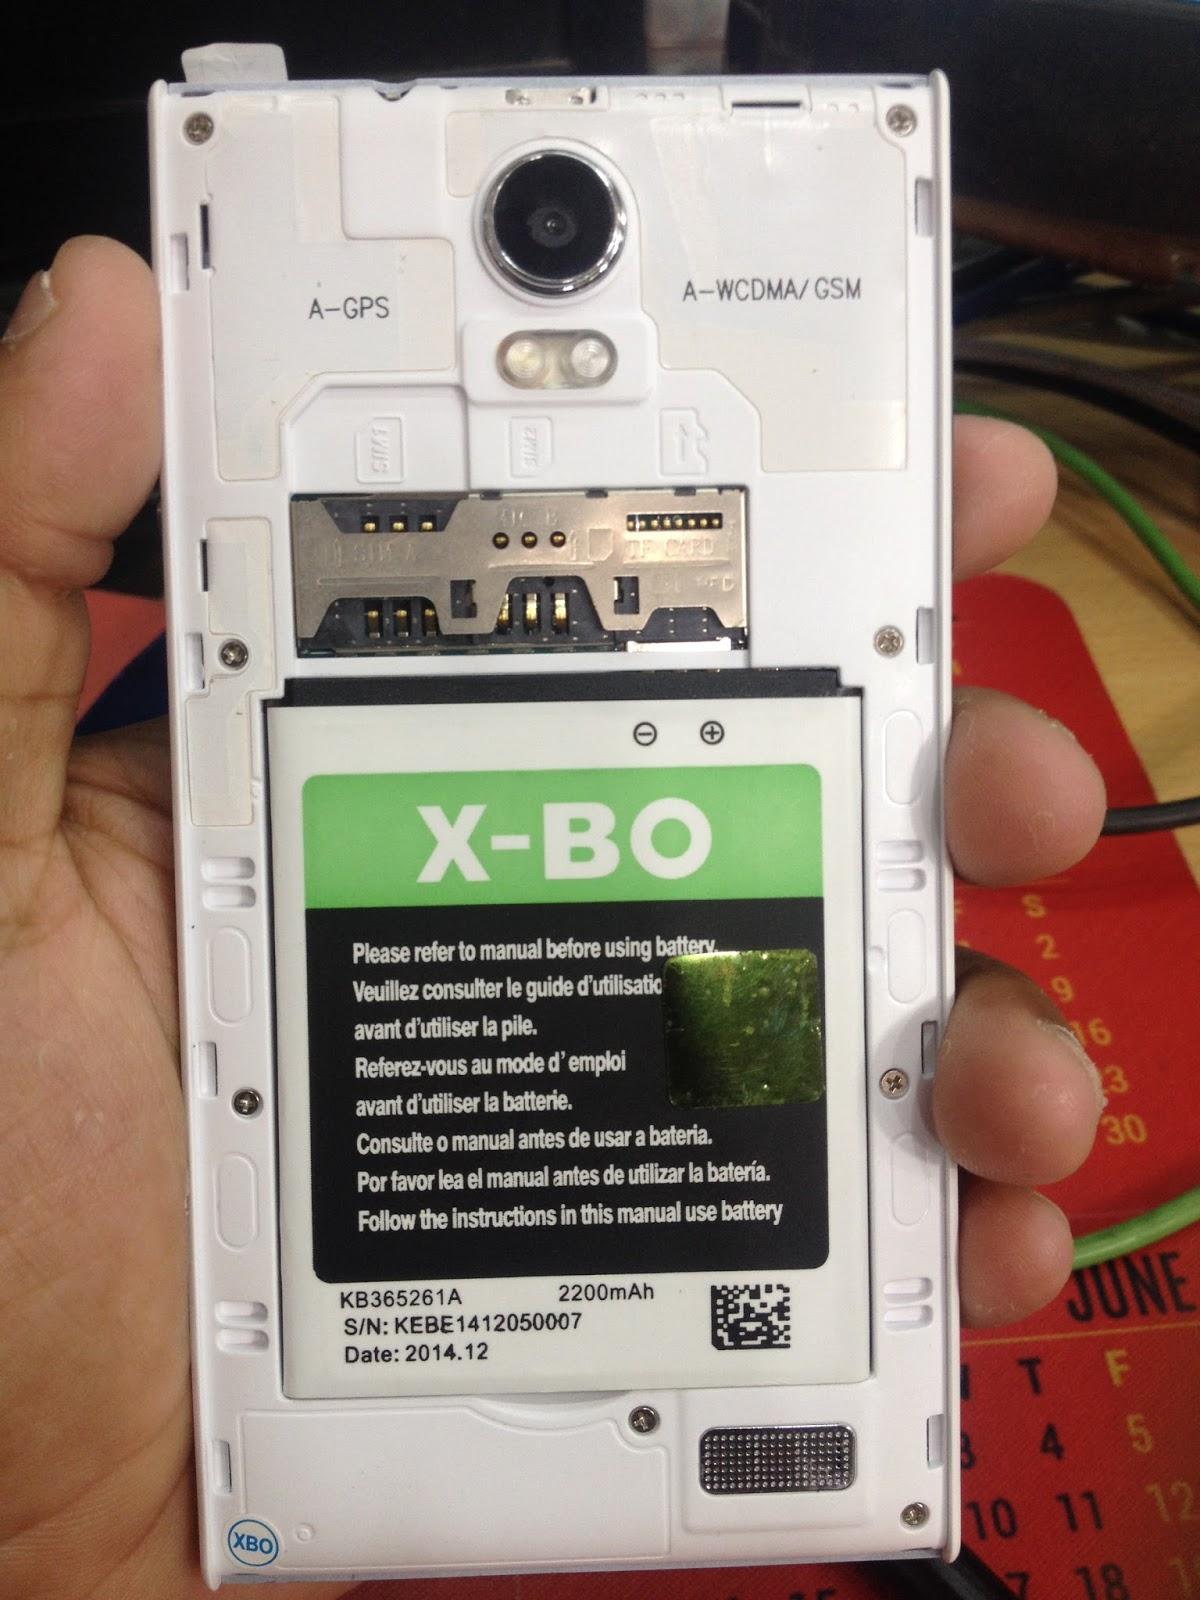 X-bo v10 dual-core android 442 wcdma bar phone w/ 55 ips, gps, wi-fi, 4gb rom - white + silver